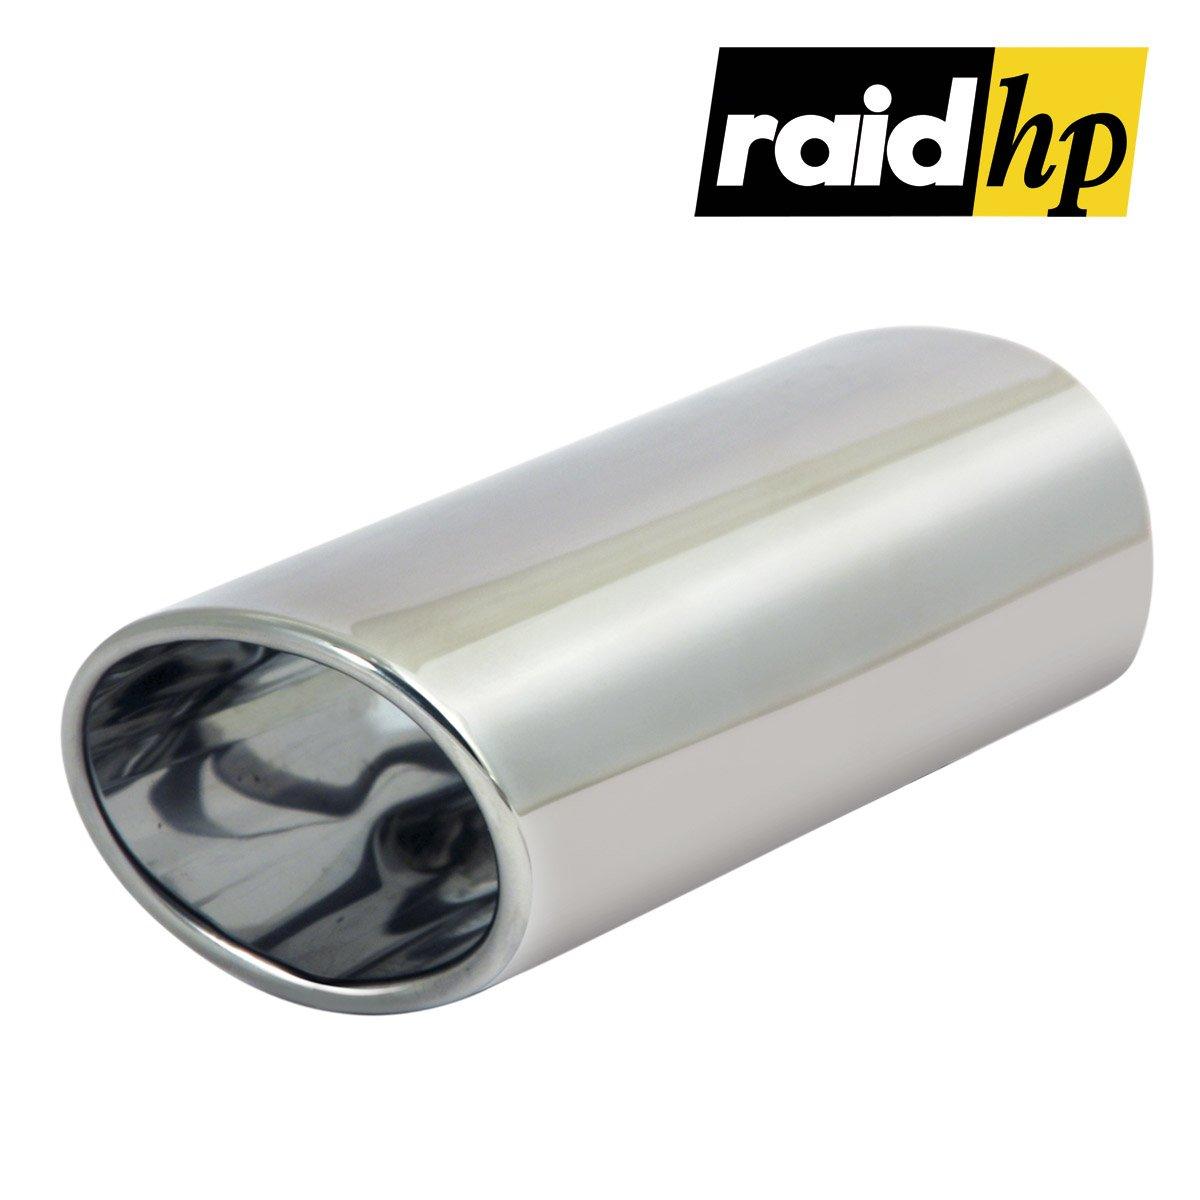 Anschlu/ßma/ß 150 mm 35-50 mm//L/änge Raid HP 291003 Auspuffblende Oval